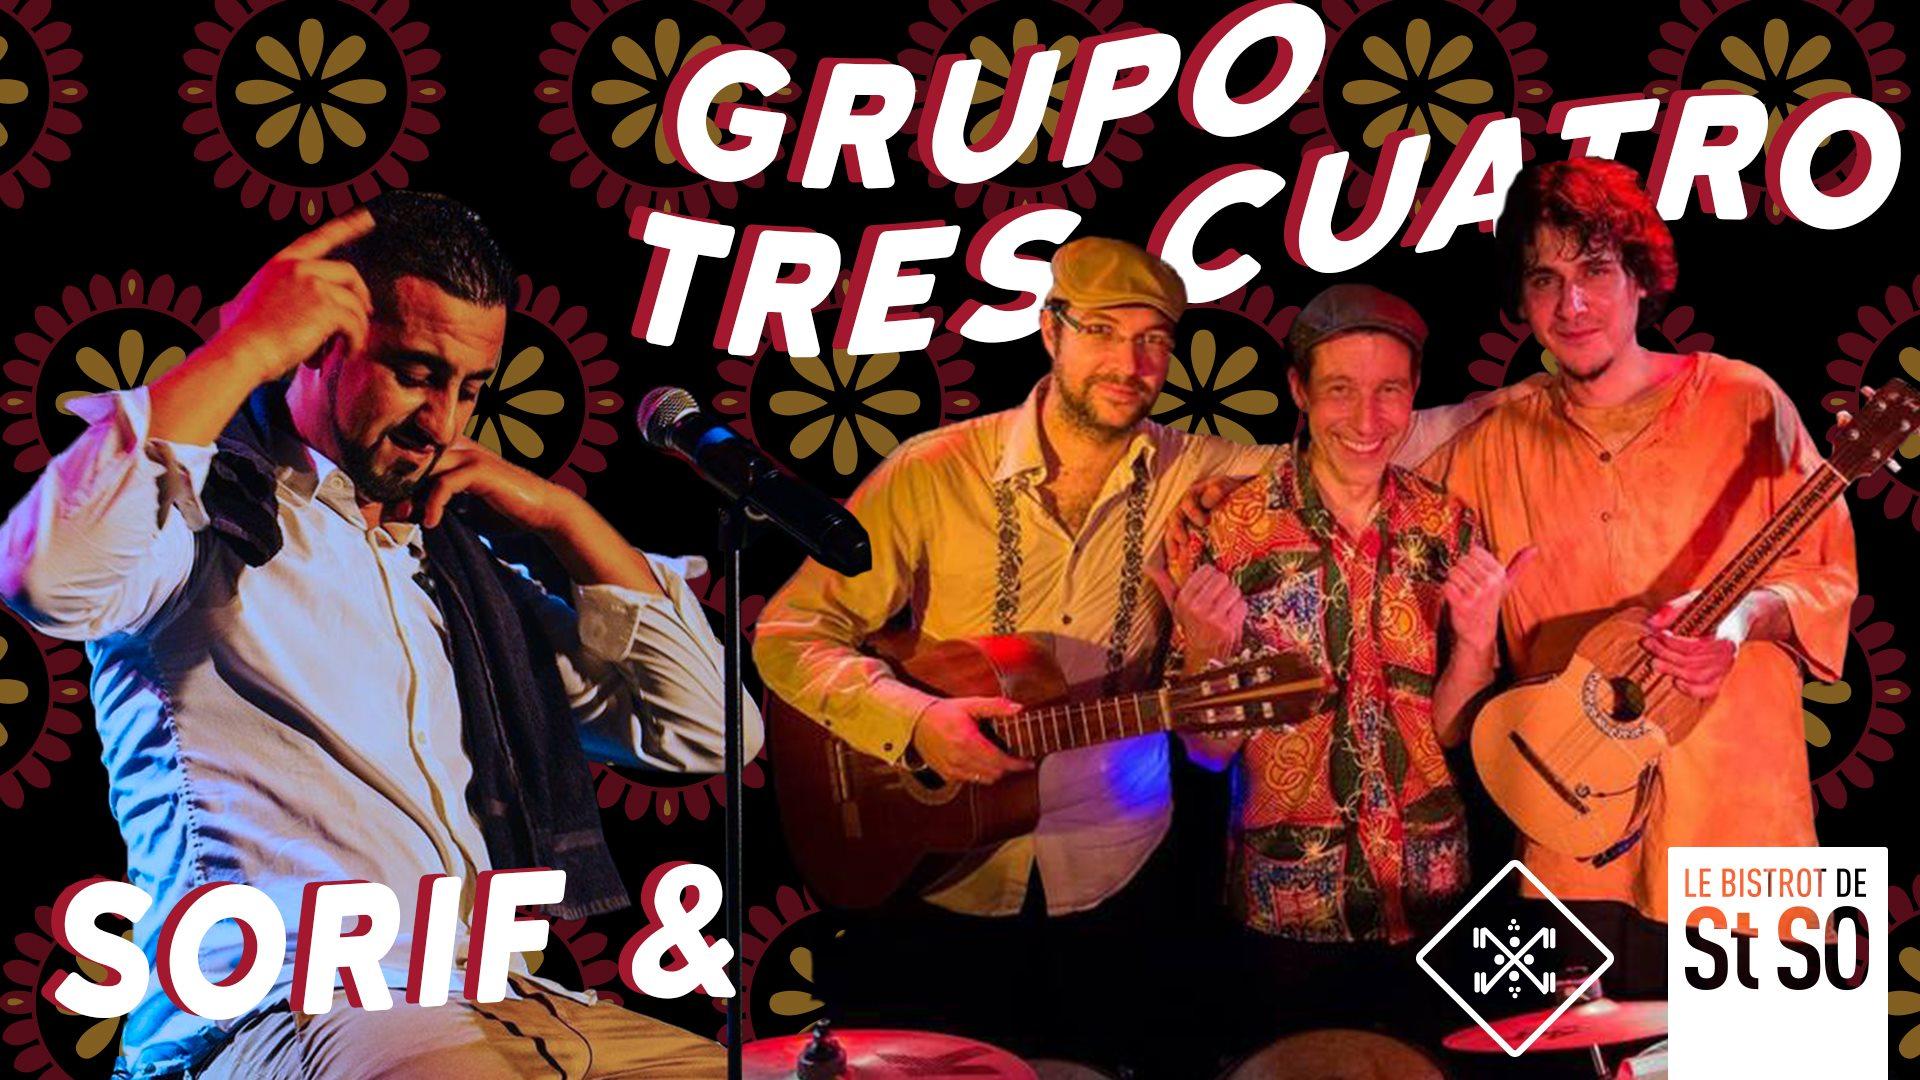 La Braderie à St So avec Sorif & Grupo Tres Cuatro